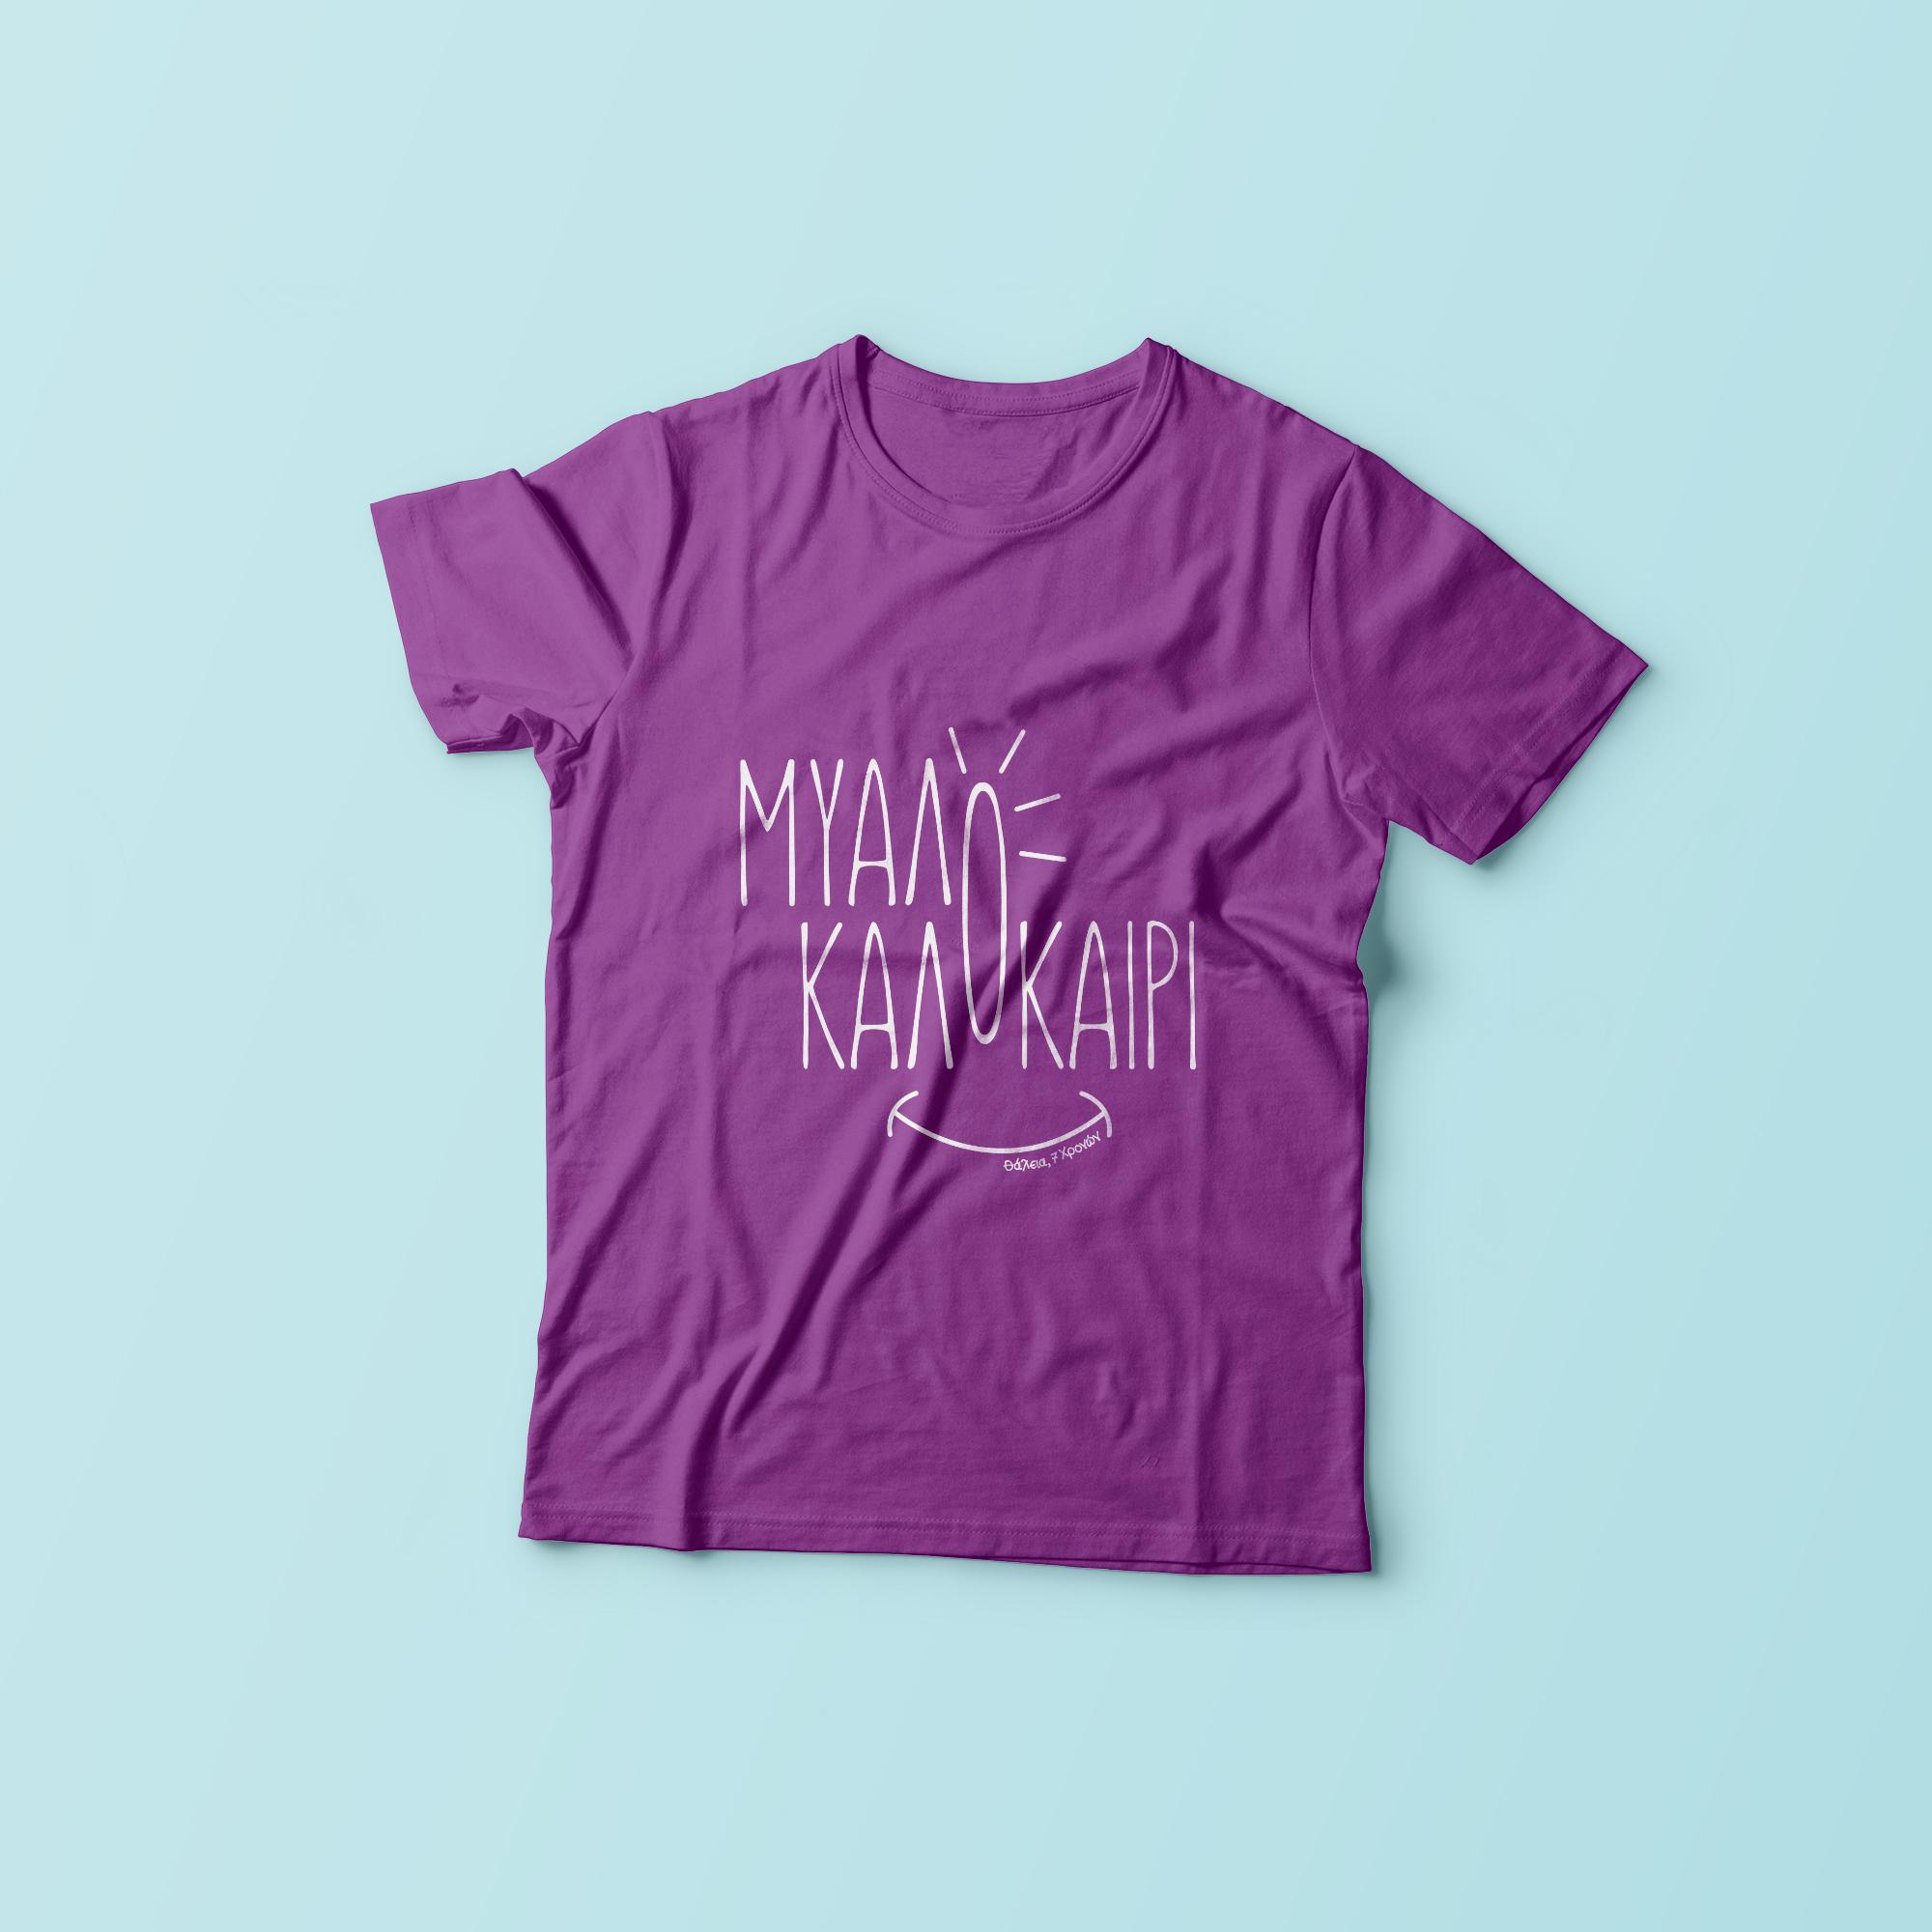 A purple t-shirt with Myalo Kalokairi design on it